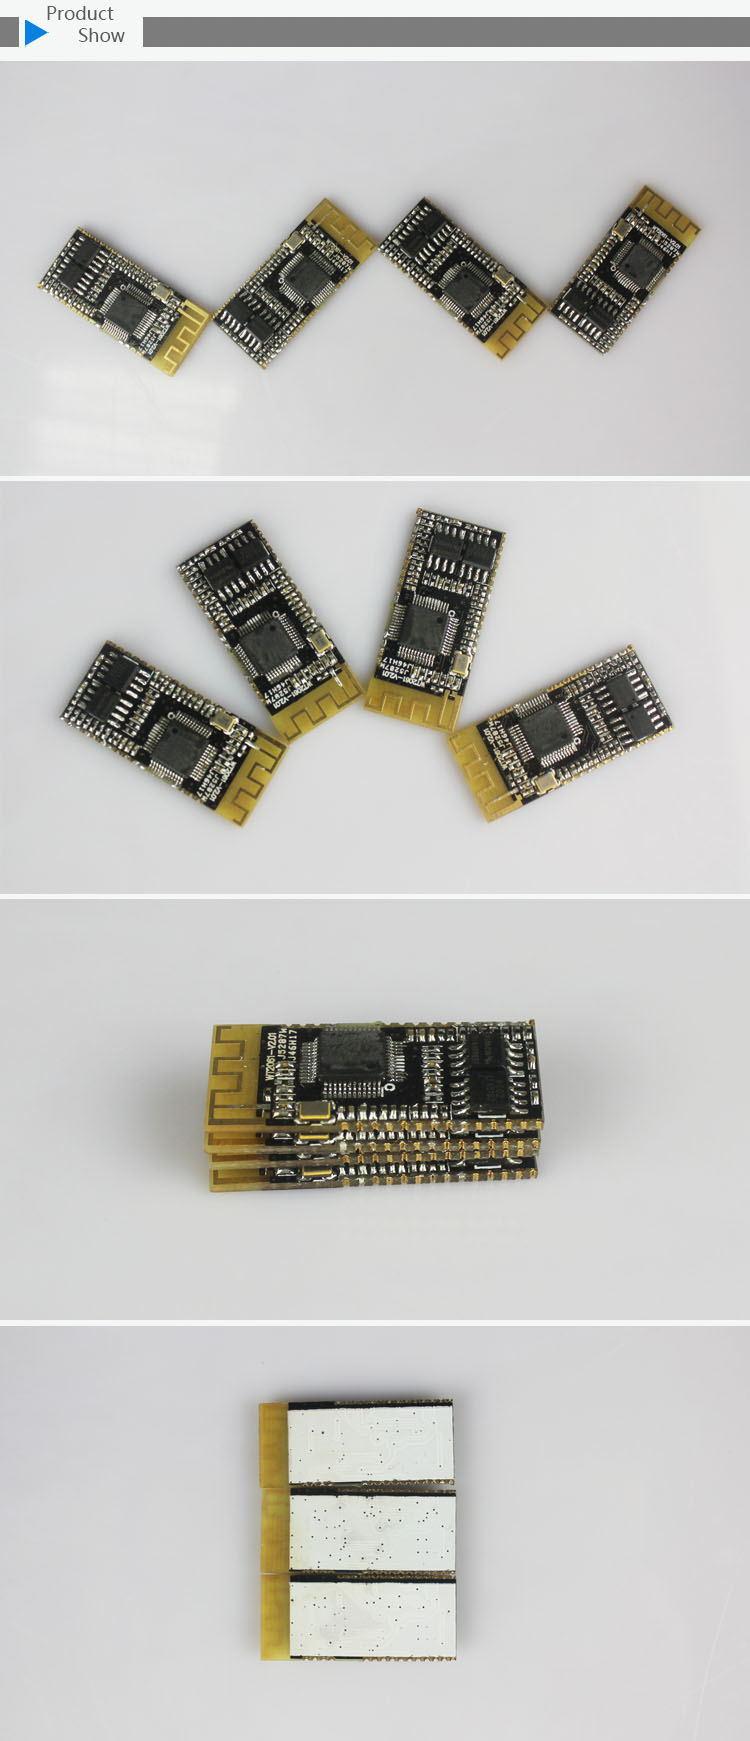 Infrared Remote Control Wireless Audio Receiver Electronic Mp3 Sound Keymemoryinfraredremotecontrolreceivercircuit Ic Module